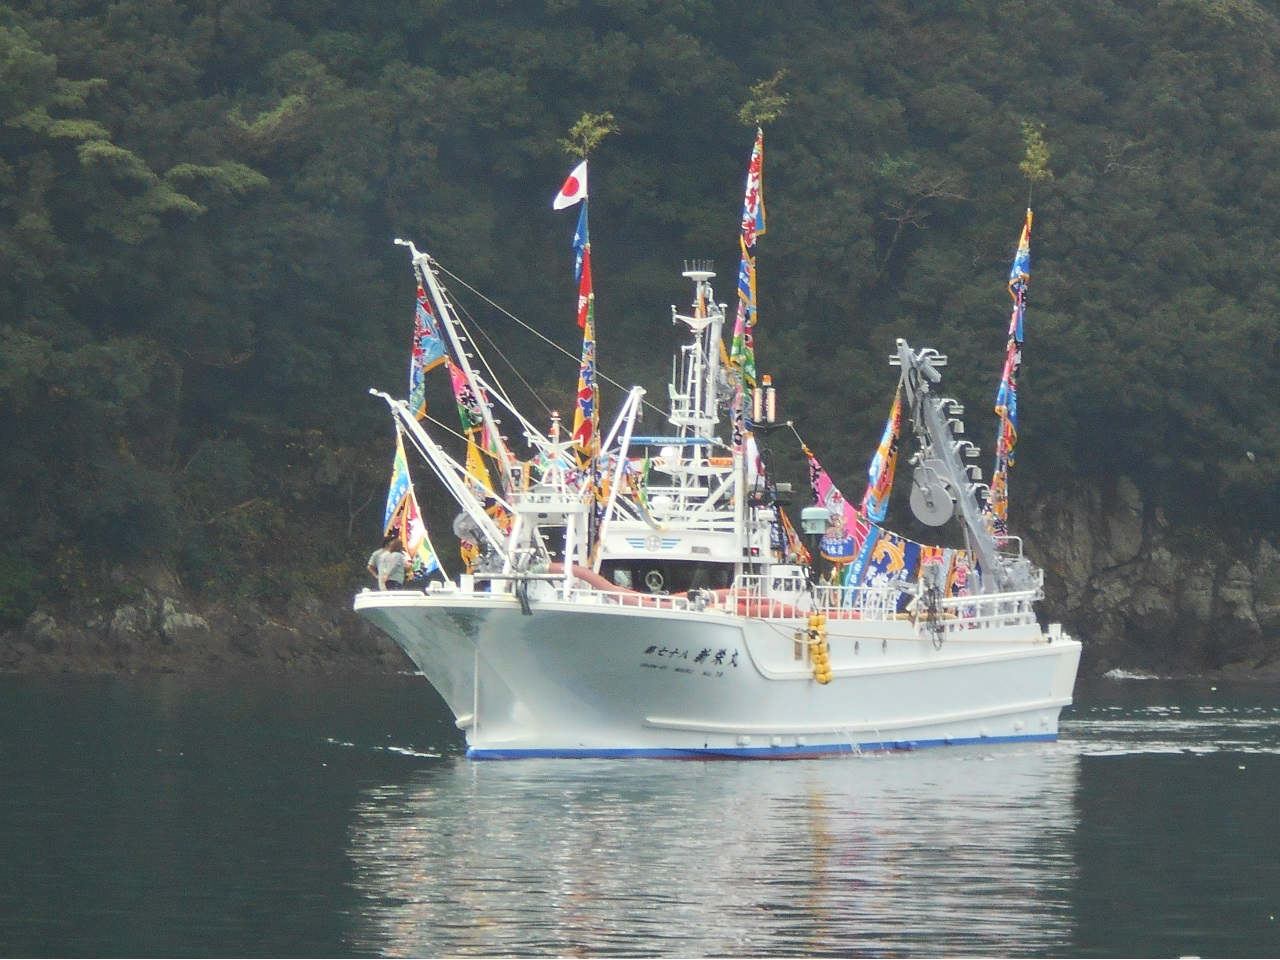 Nishi-F Up to Date月別アーカイブ: 2015年11月19t型まき網本船 「第七十八新栄丸」 祝進水